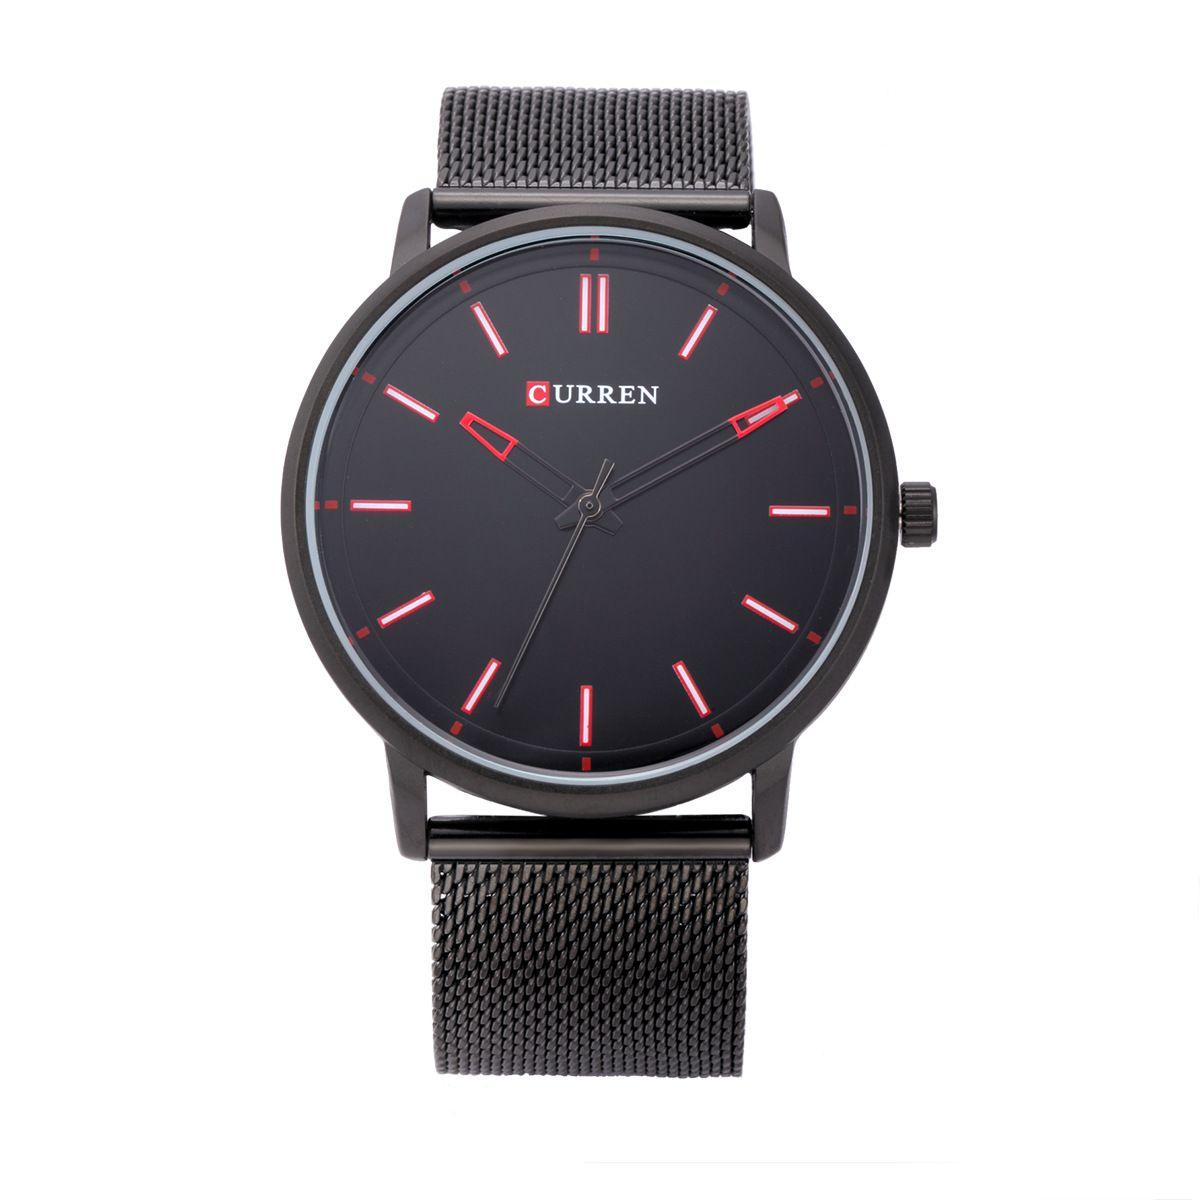 Fashion Steel Belt Quartz Watch Elegant Dress Simple Leather Strap Ultra Slim Male Wrist Watch Womens Mesh Belt Watch Hours Quartz Watches Men's Watches